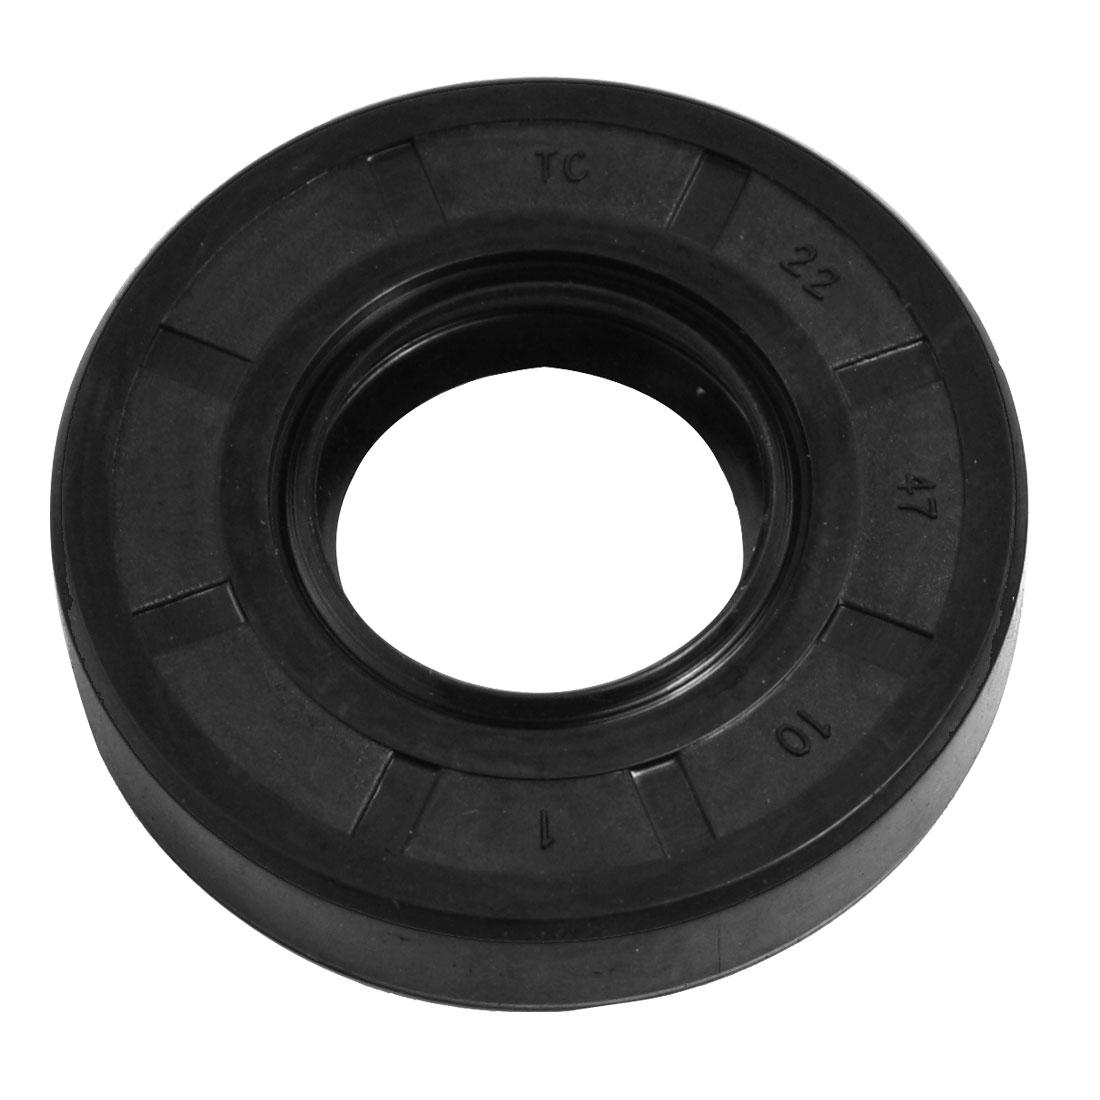 22mm x 47mm x 10mm Steel Spring NBR Double Lip TC Oil Shaft Seal